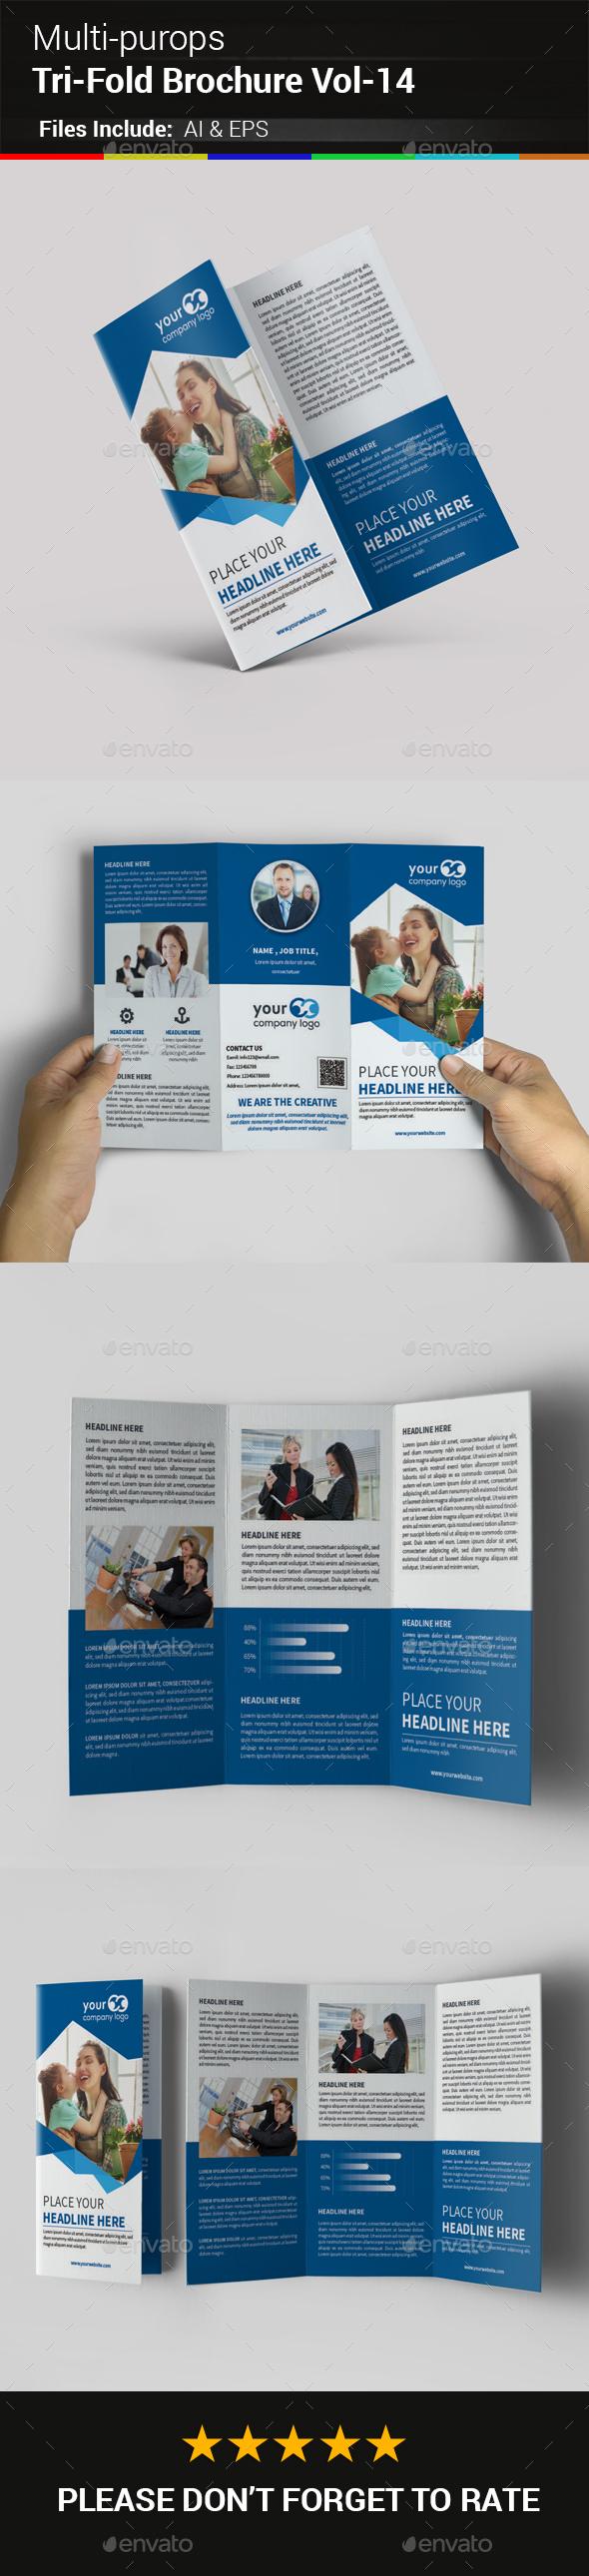 Multipurpose Business Tri-Fold Brochure Vol-14 - Corporate Brochures